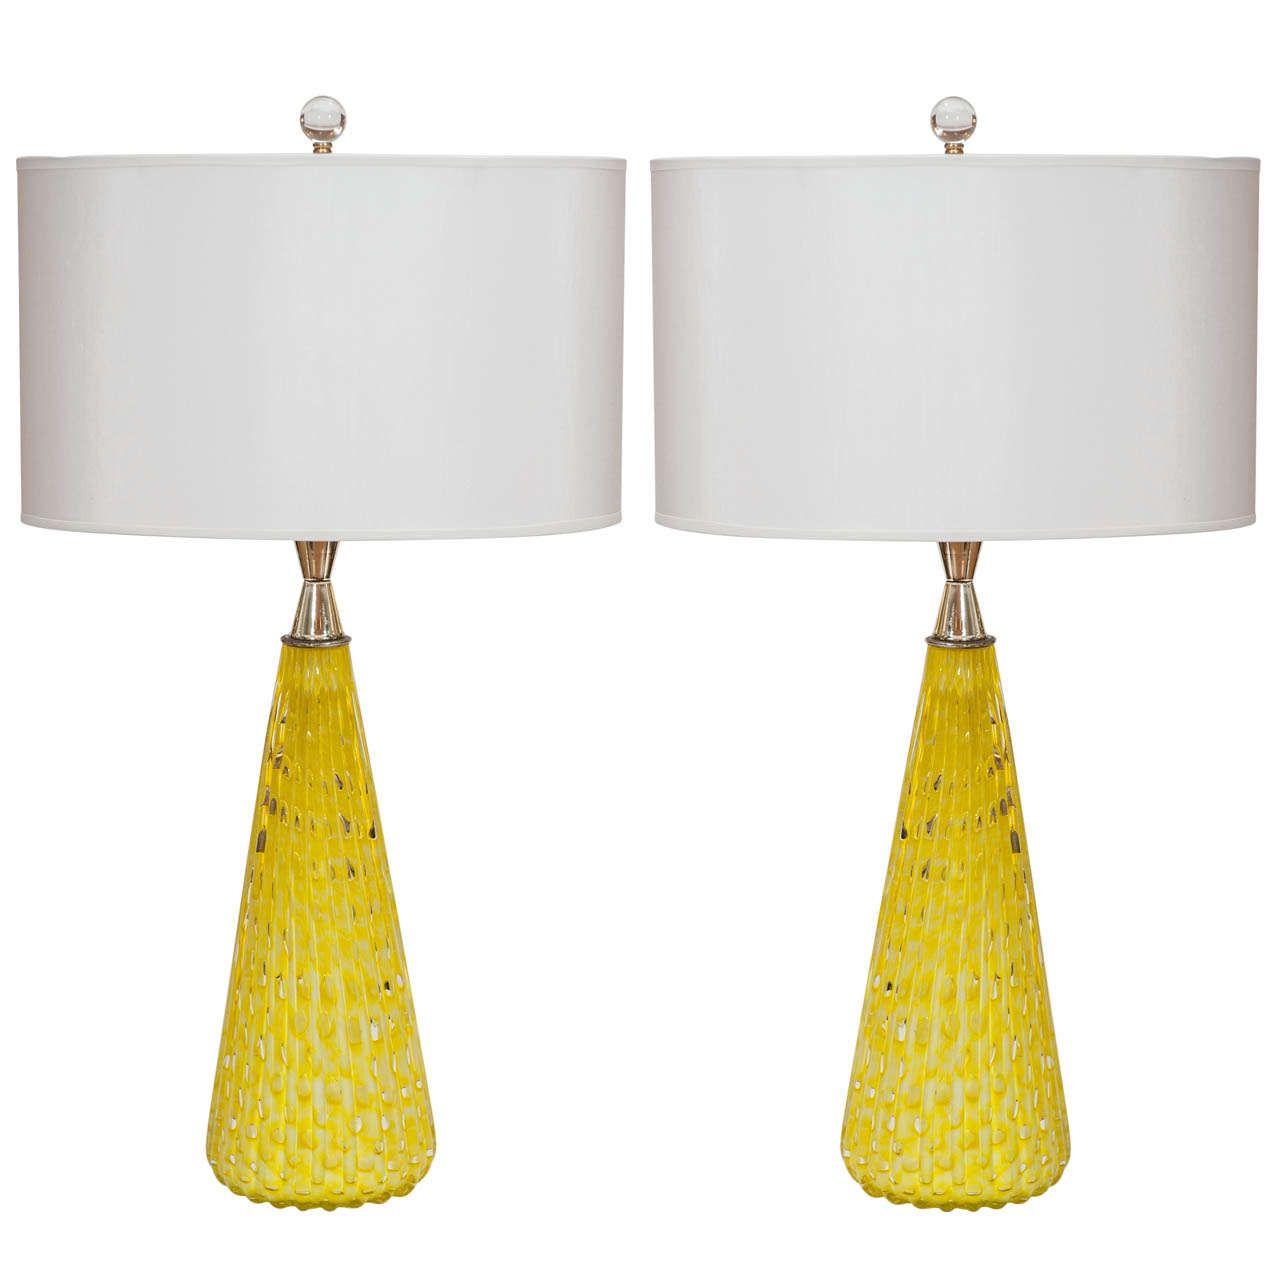 Chandeliers Pair Of Citrus Yellow Murano Lamps